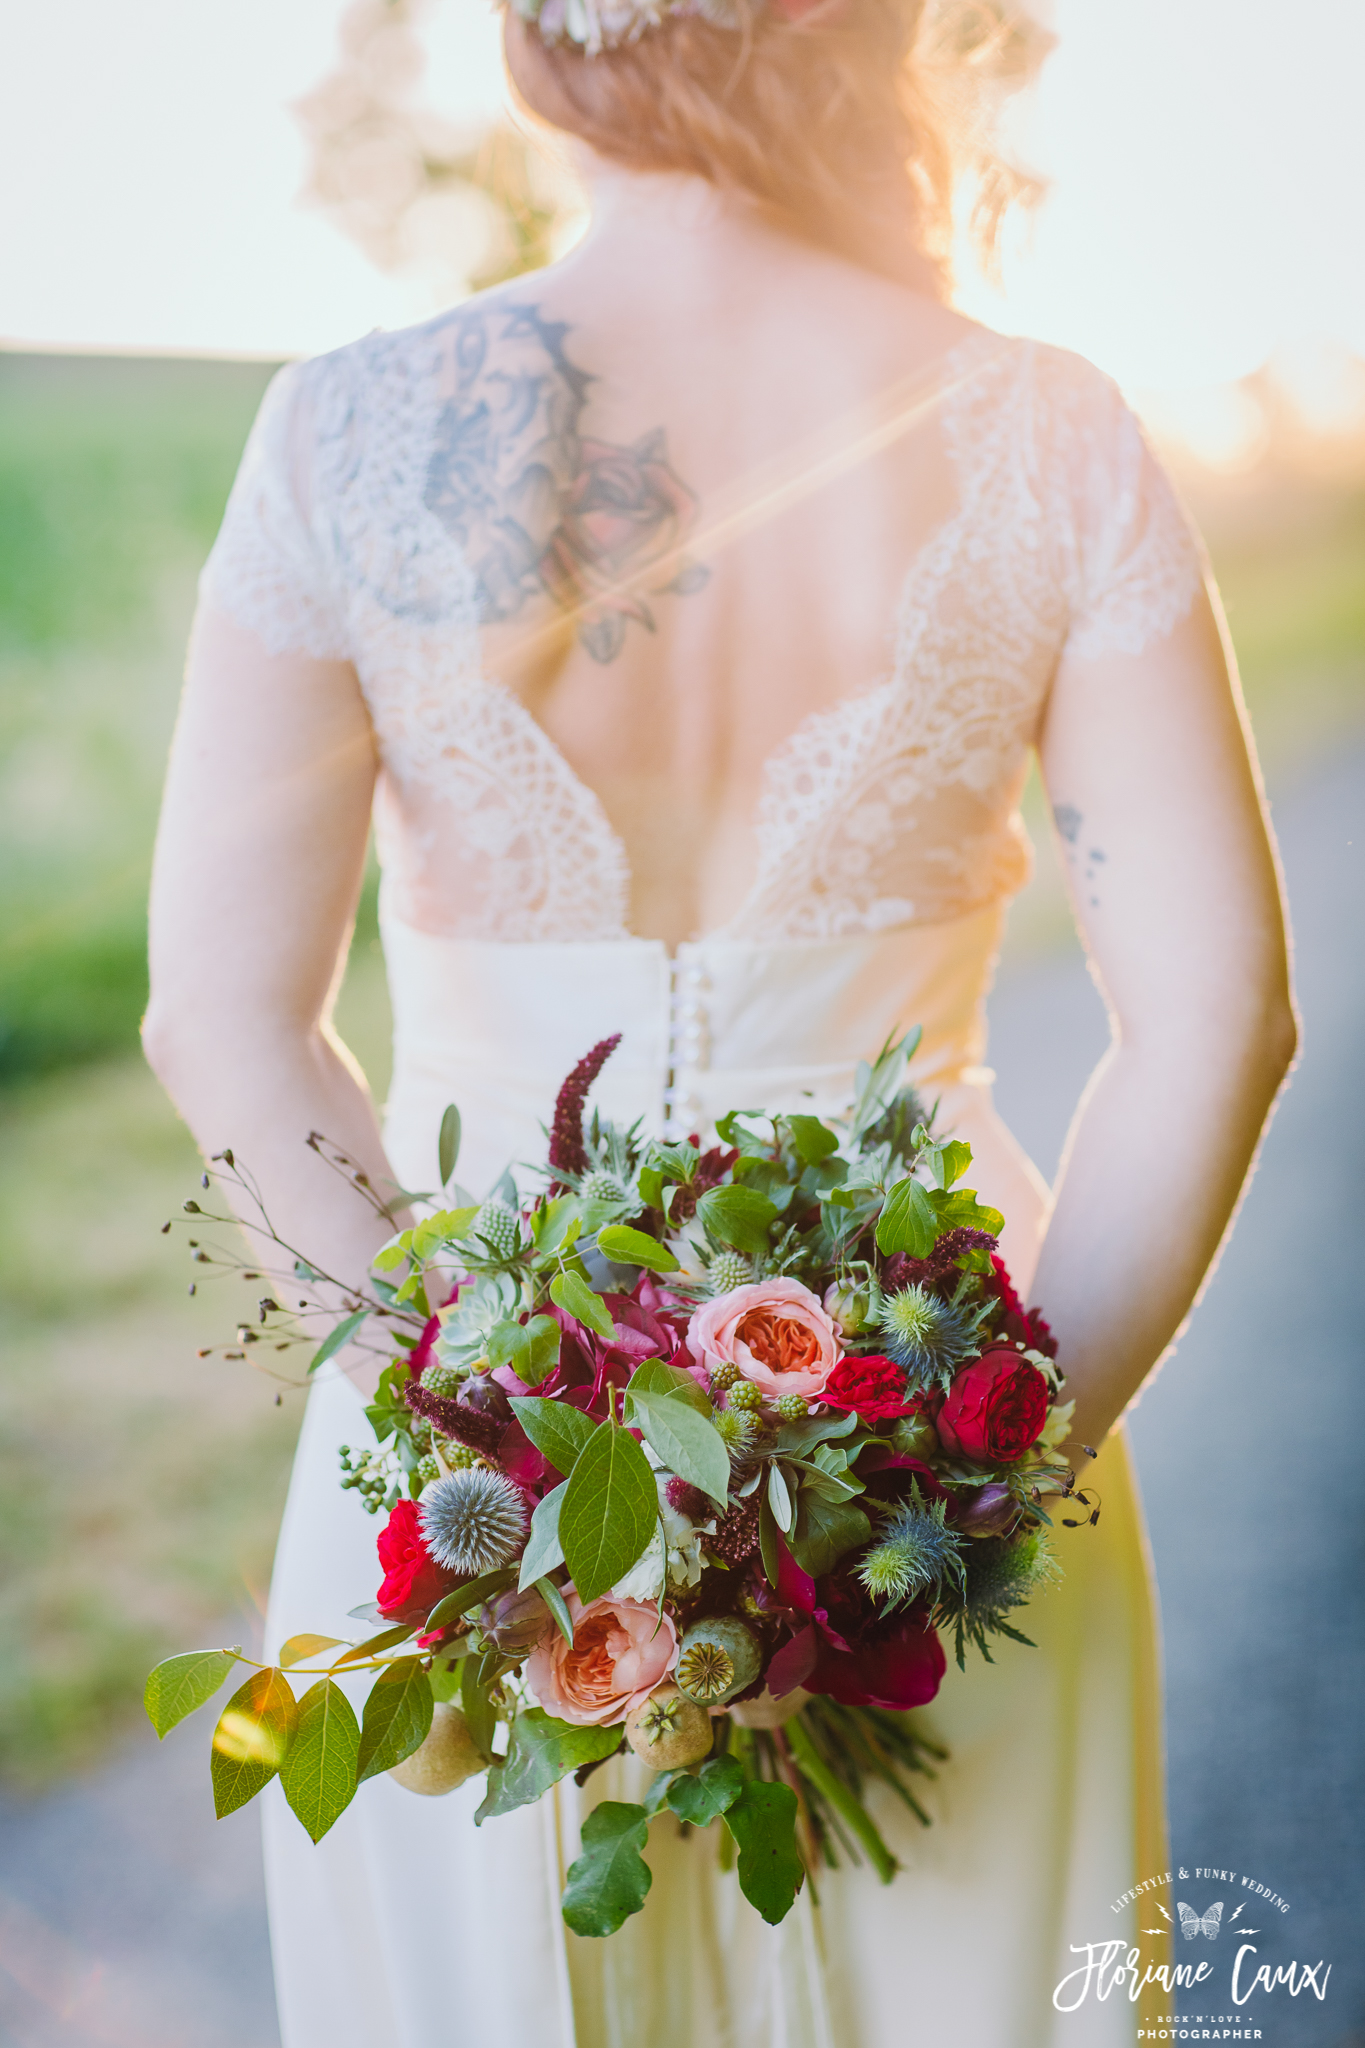 photographe-mariage-toulouse-rocknroll-maries-tatoues-floriane-caux-79